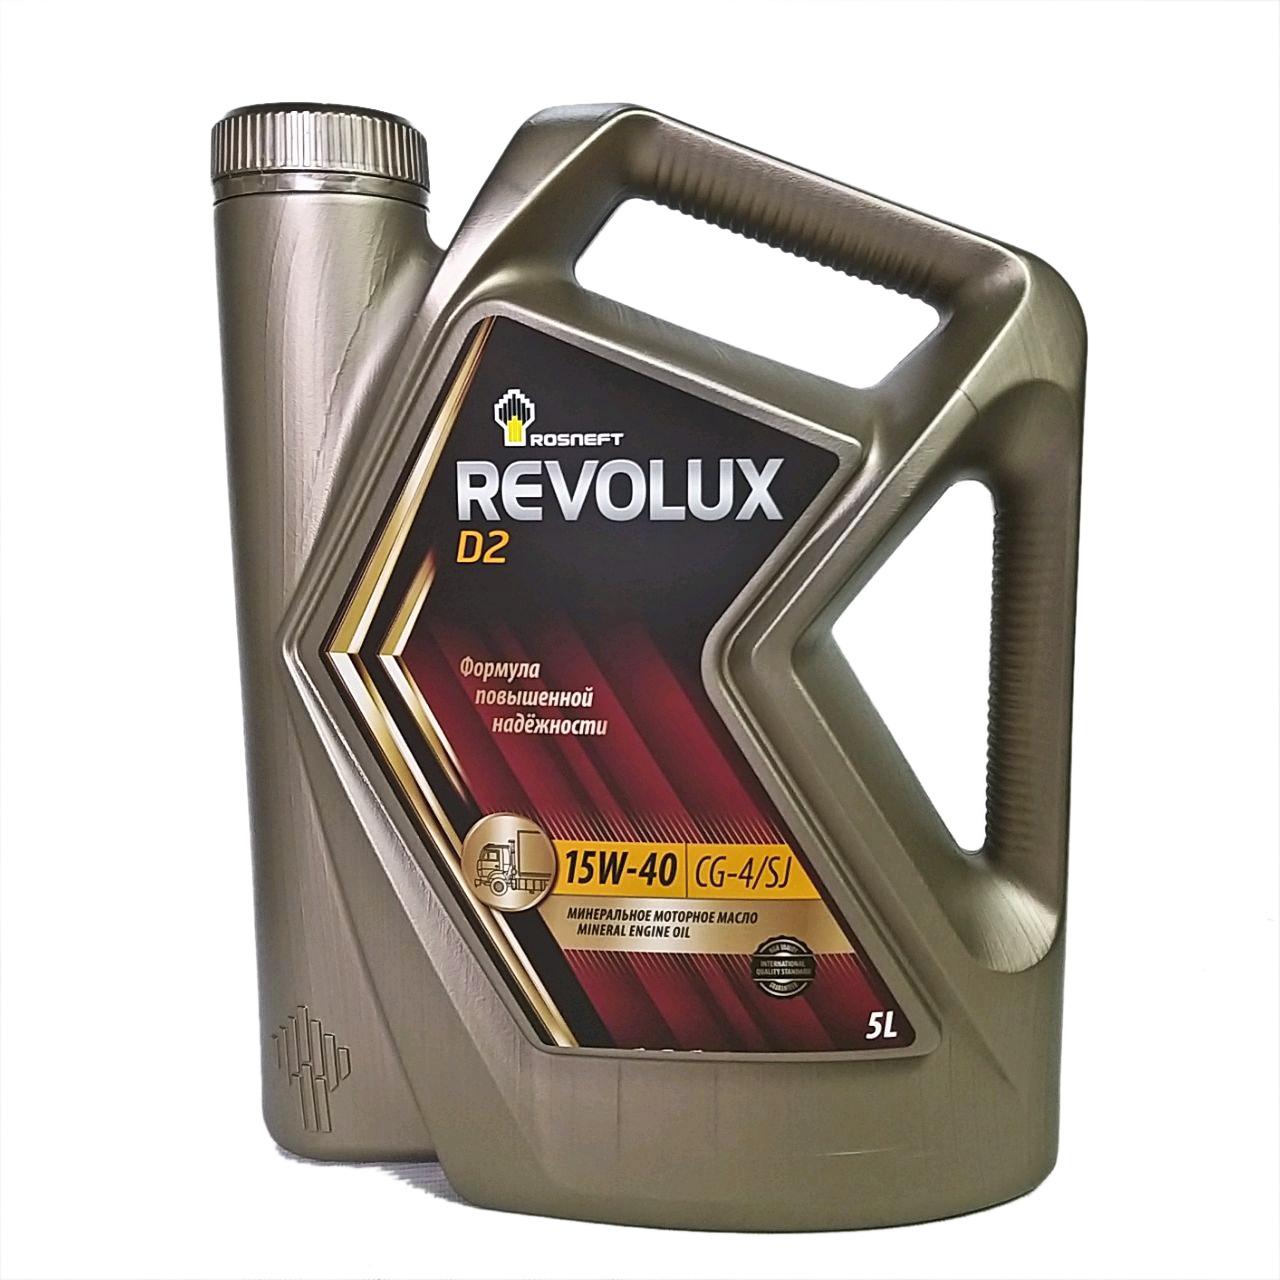 Rosneft Revolux D2 15w-40 (5 L.)